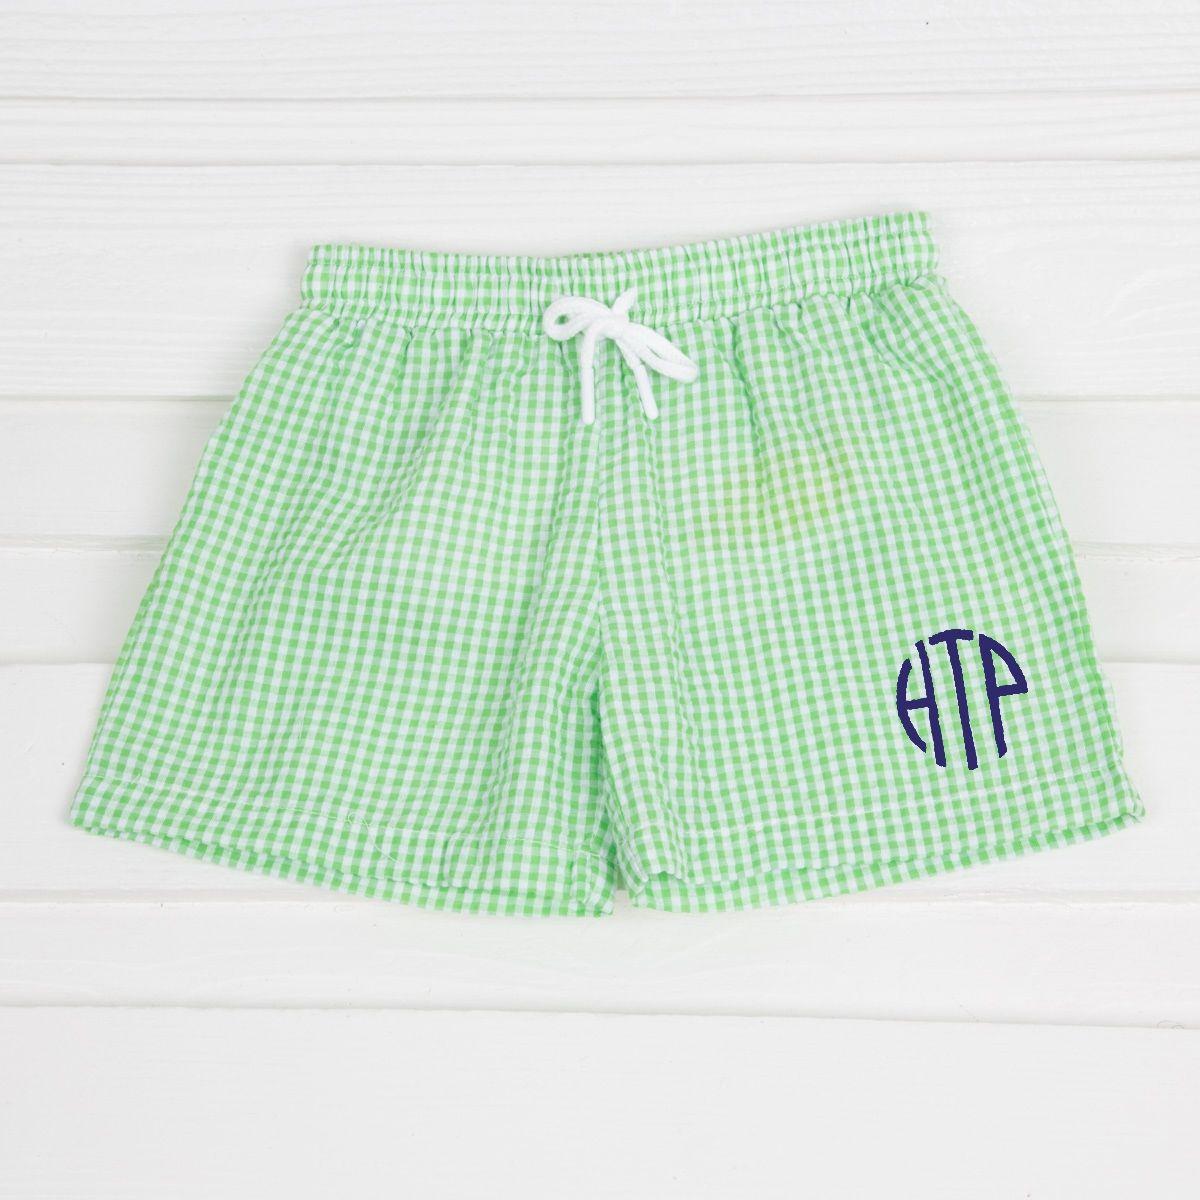 d0117da176 Cotton blend seersucker. *NOT LYCRA* Mesh lined. Tie waist band.  #smockedauctions #boysfashion #summer #swim #green #seersucker #gingham  #monogram #trunks # ...